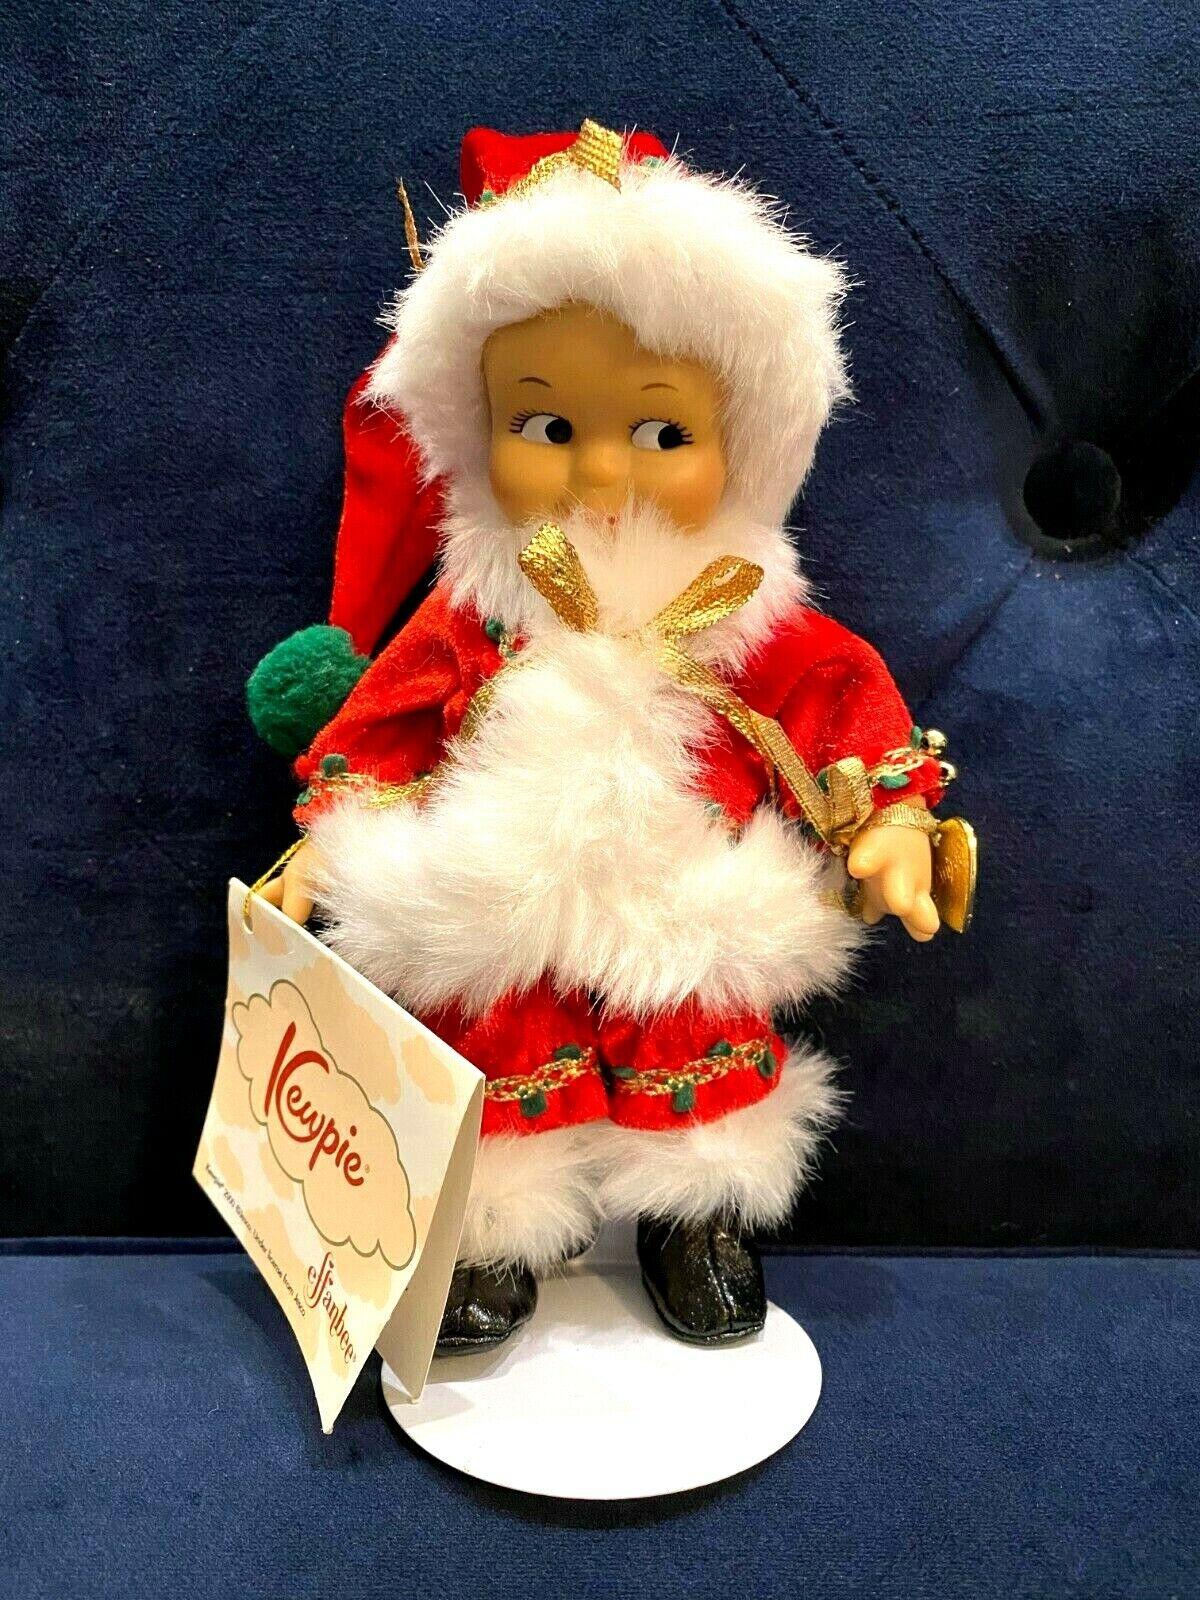 Effanbee - 8 Santa Kewpie Doll - Stand Charm - V3008 - Has Tags But No Box  - $14.99